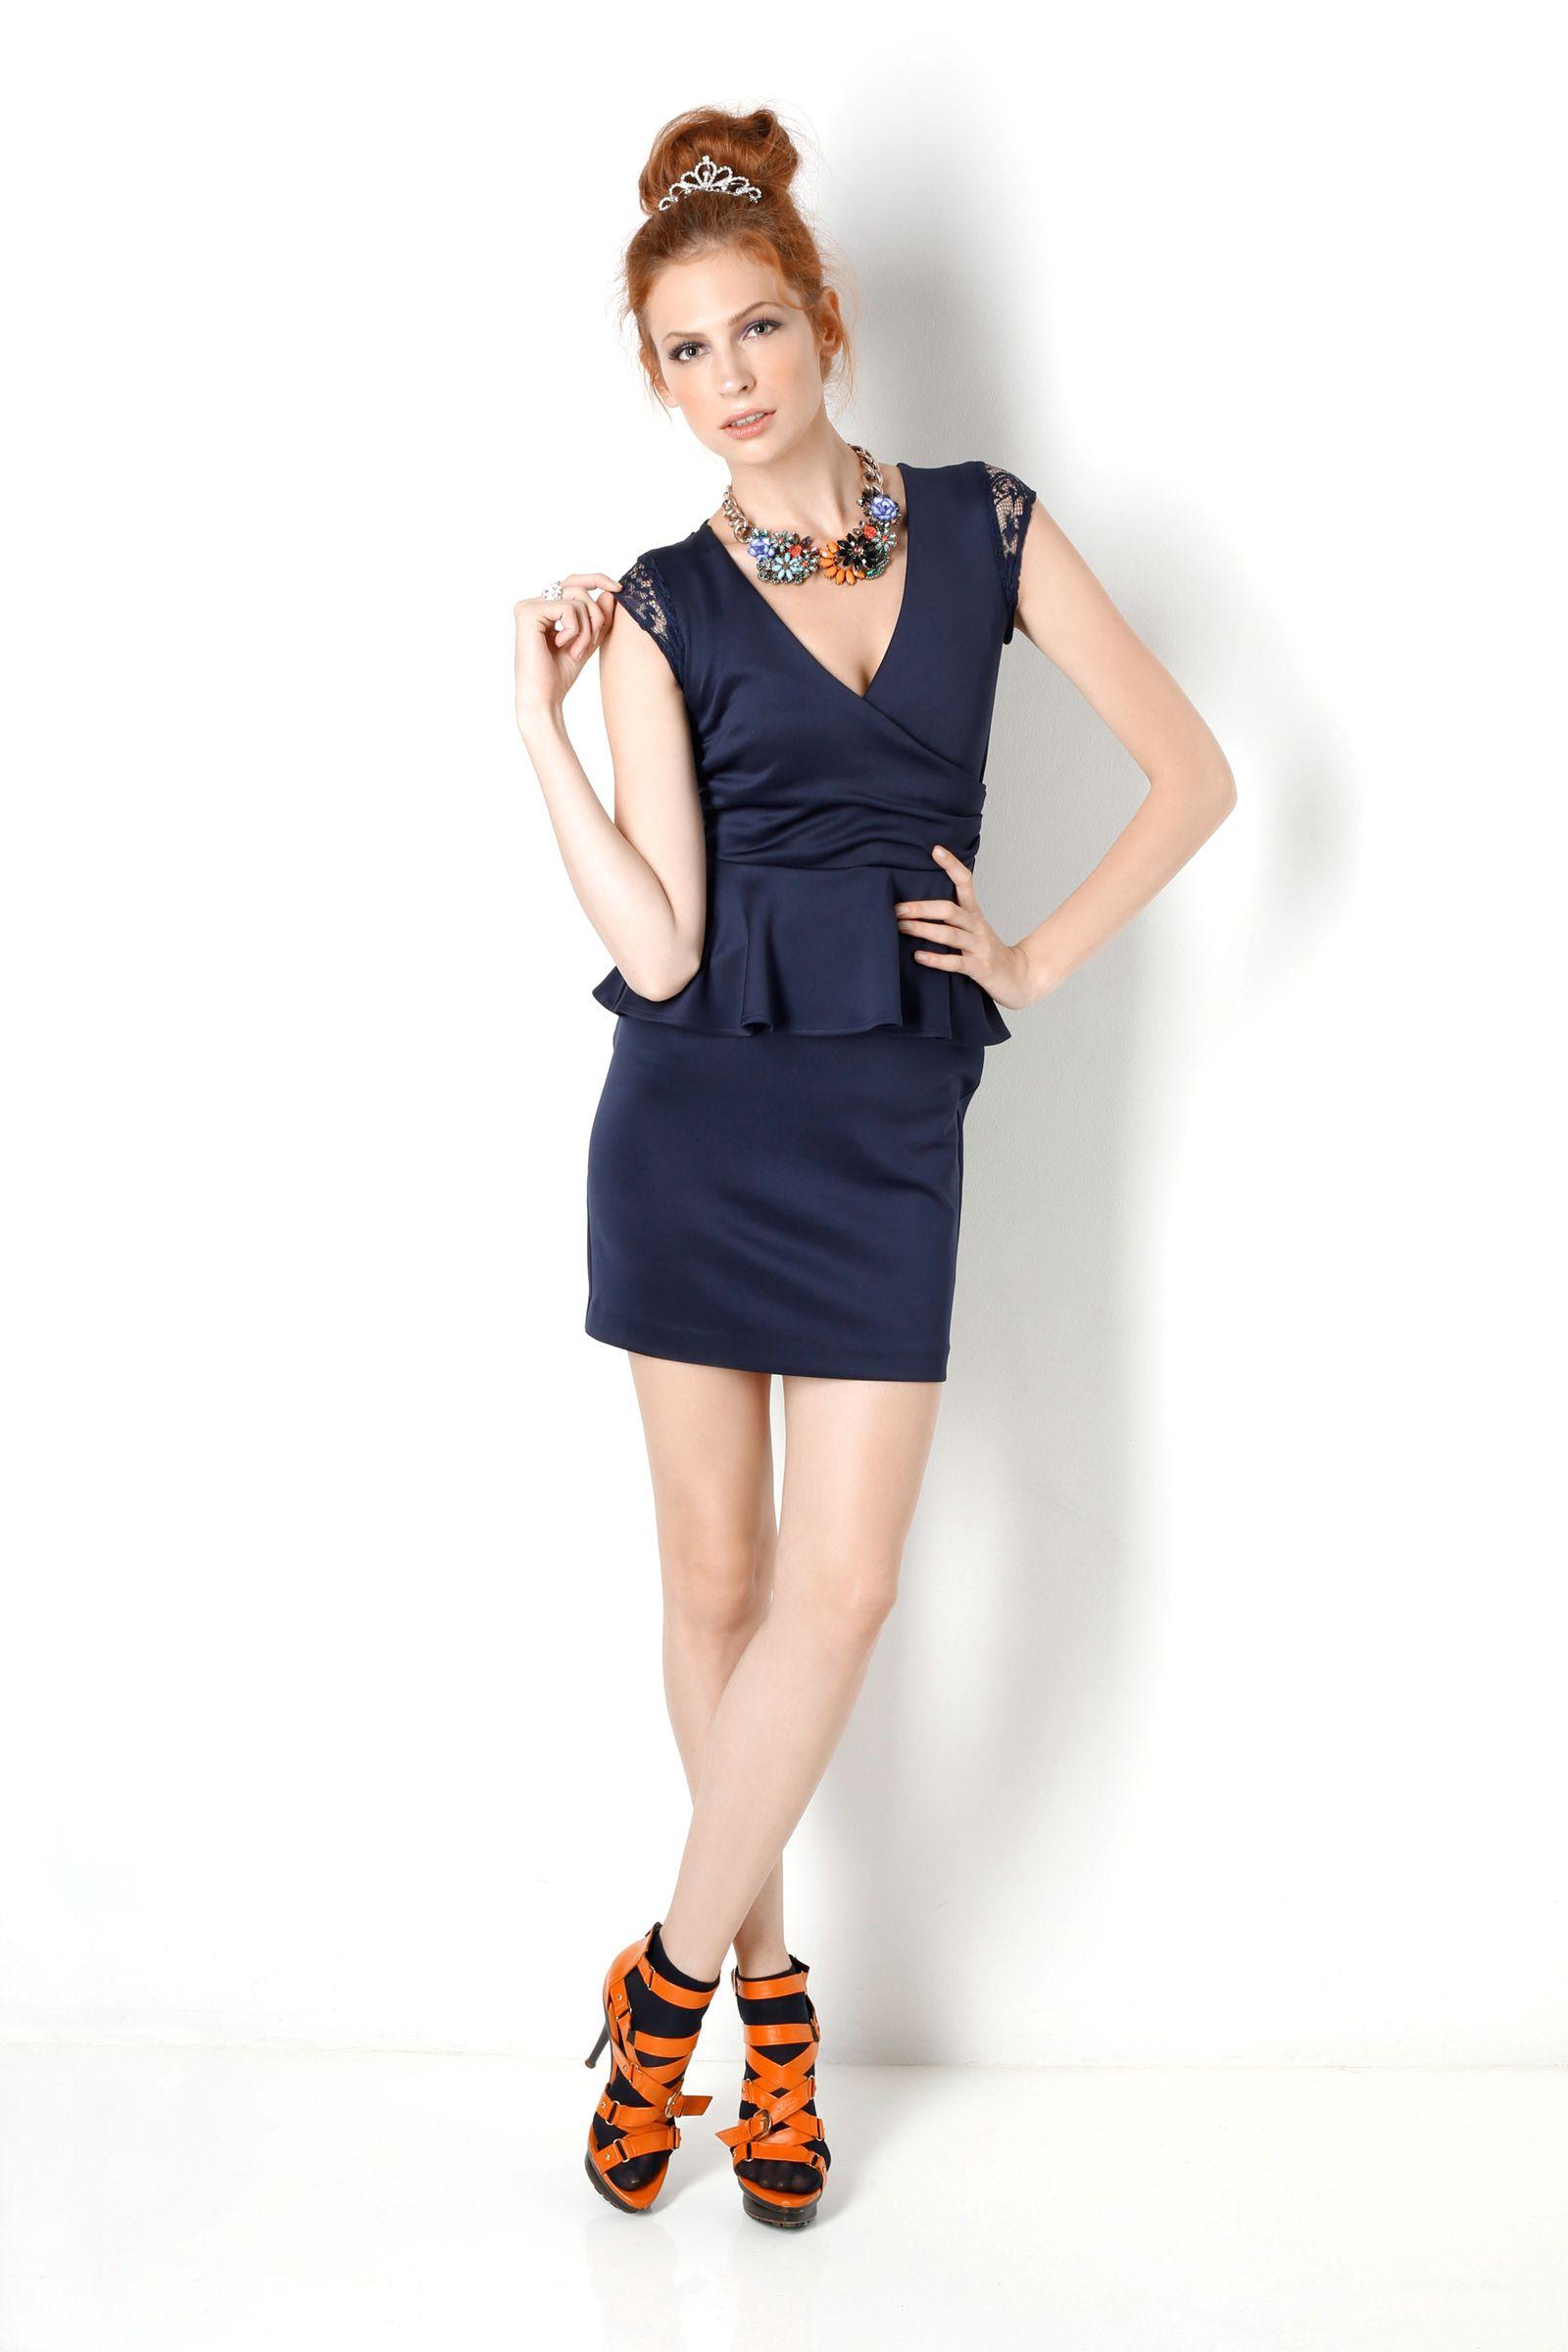 Modelo Vestido 3CC02446- $799.00